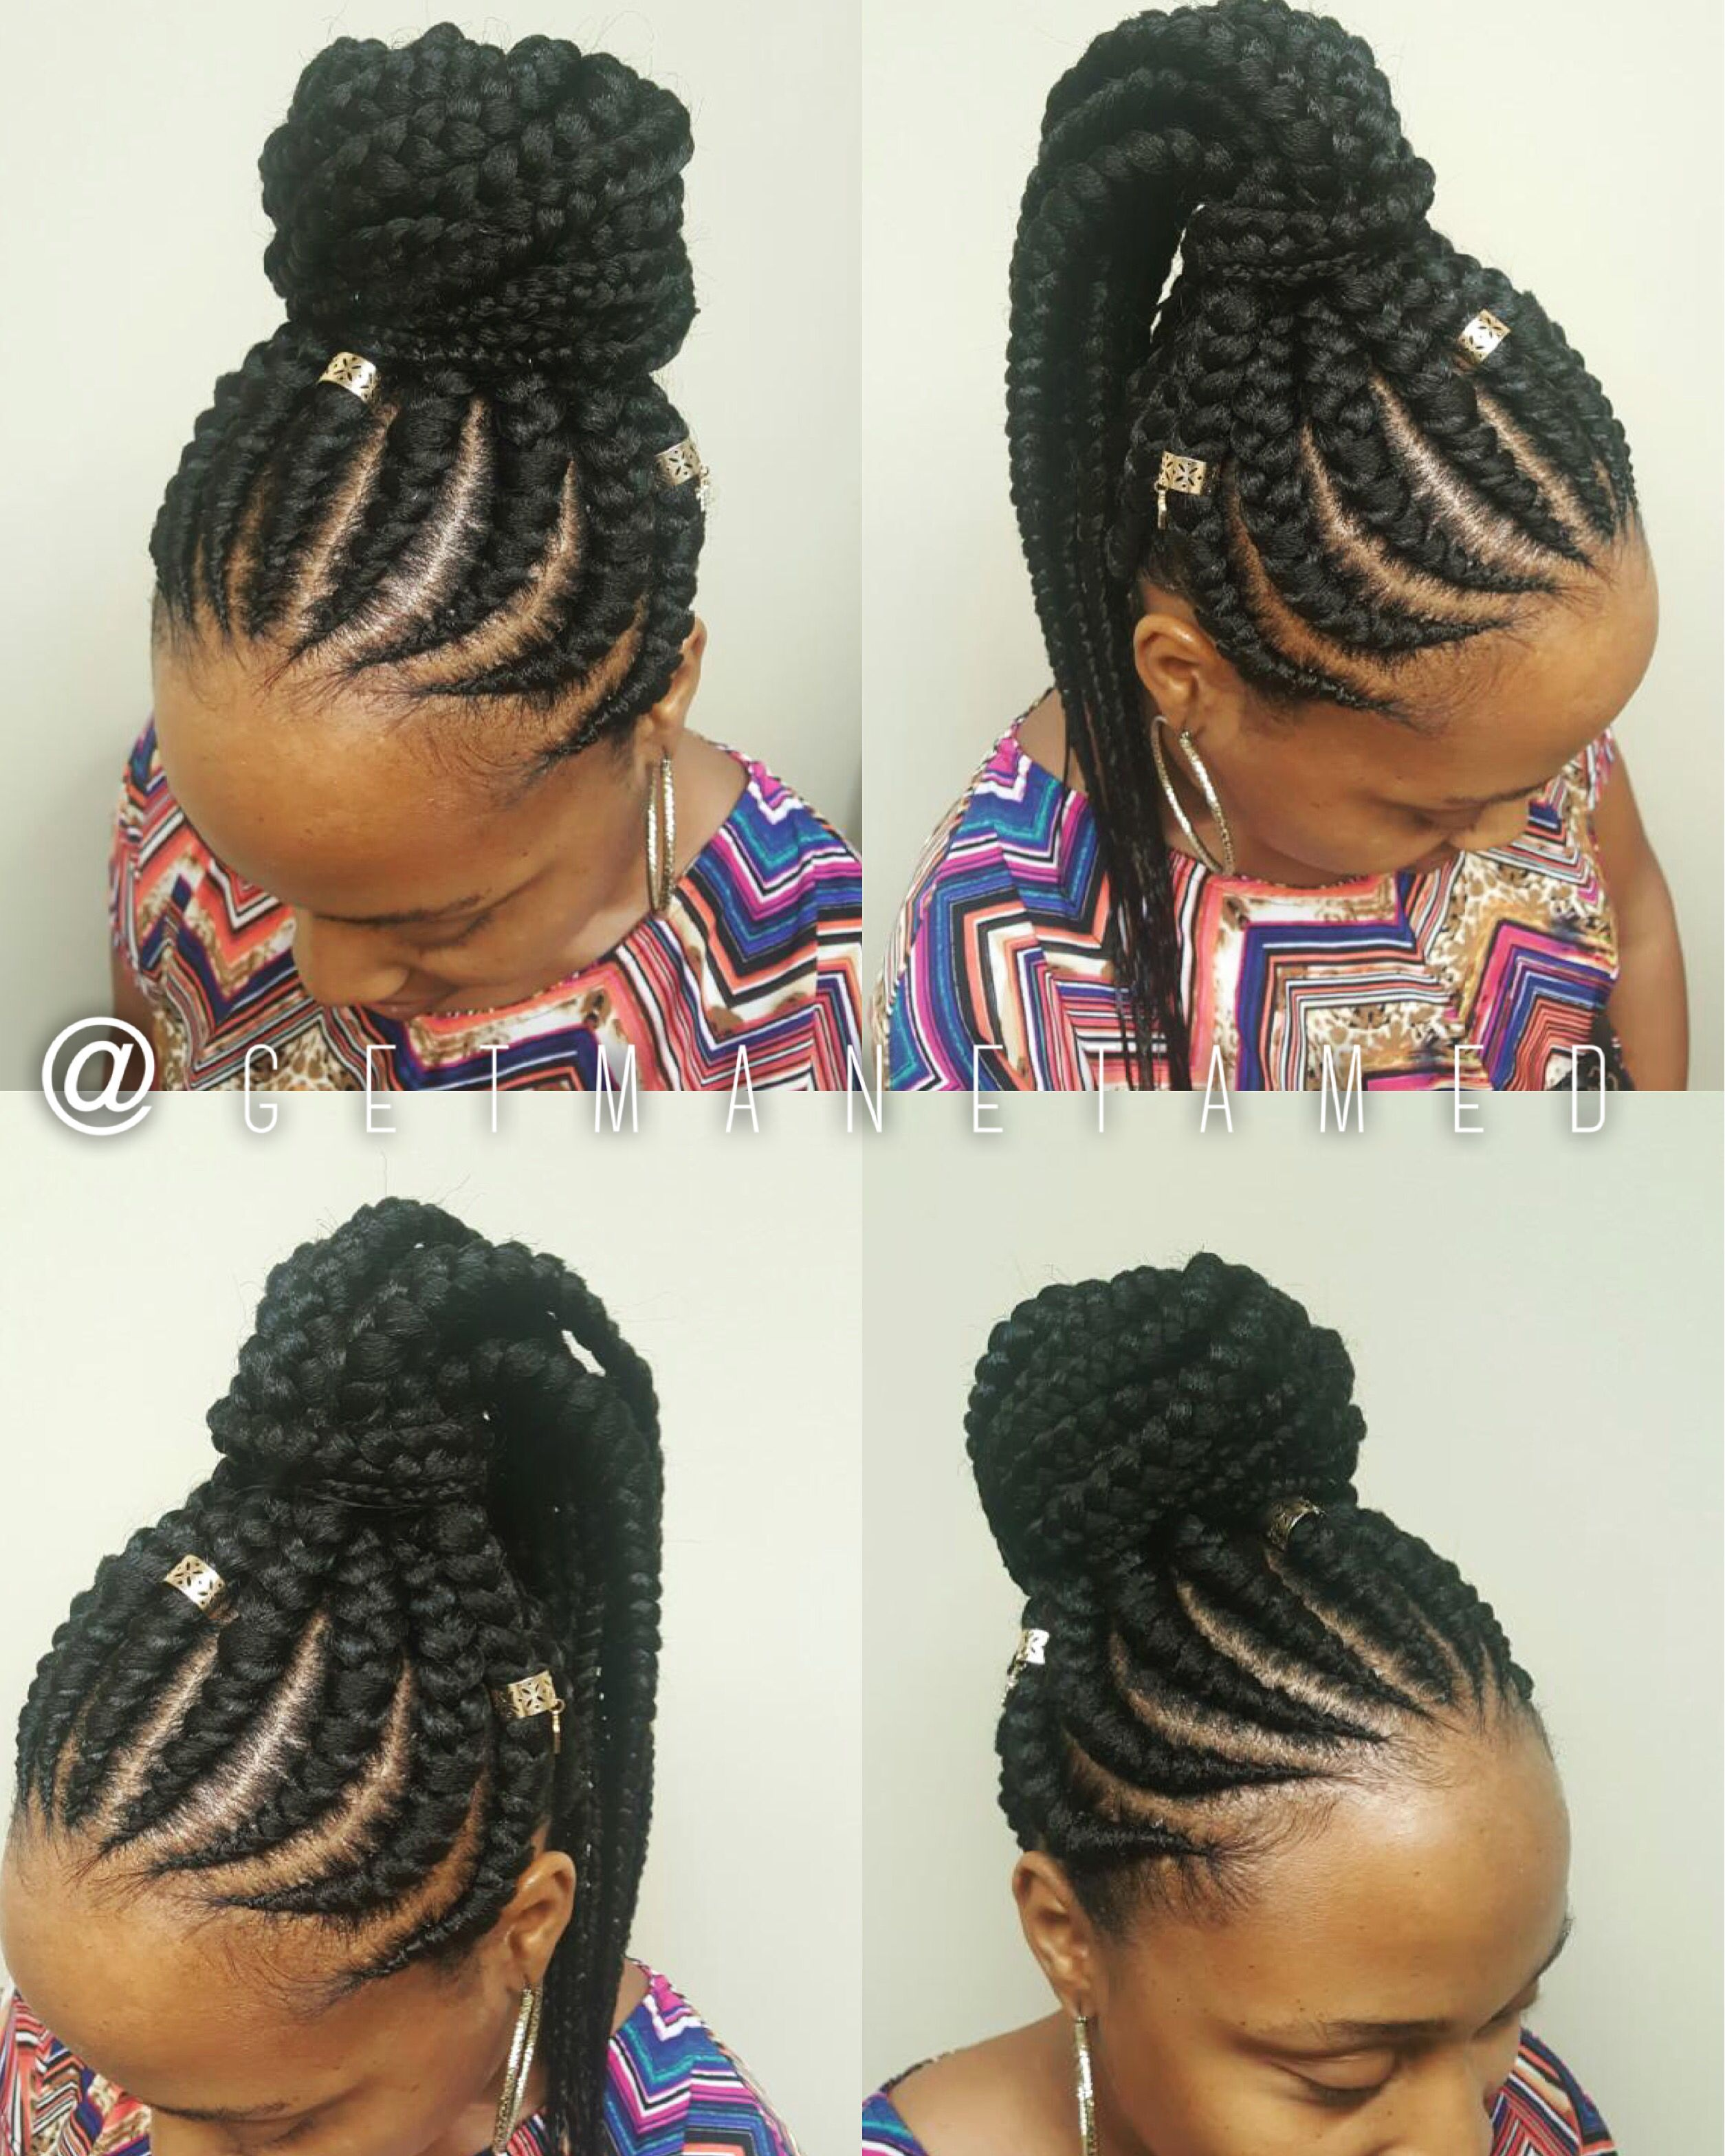 Feed In Braids Feed In Cornrows Ghana Cornrows Braid Designs Cornrows Cornrow Designs Instagra Hair Styles Braided Hairstyles Goddess Braids Hairstyles